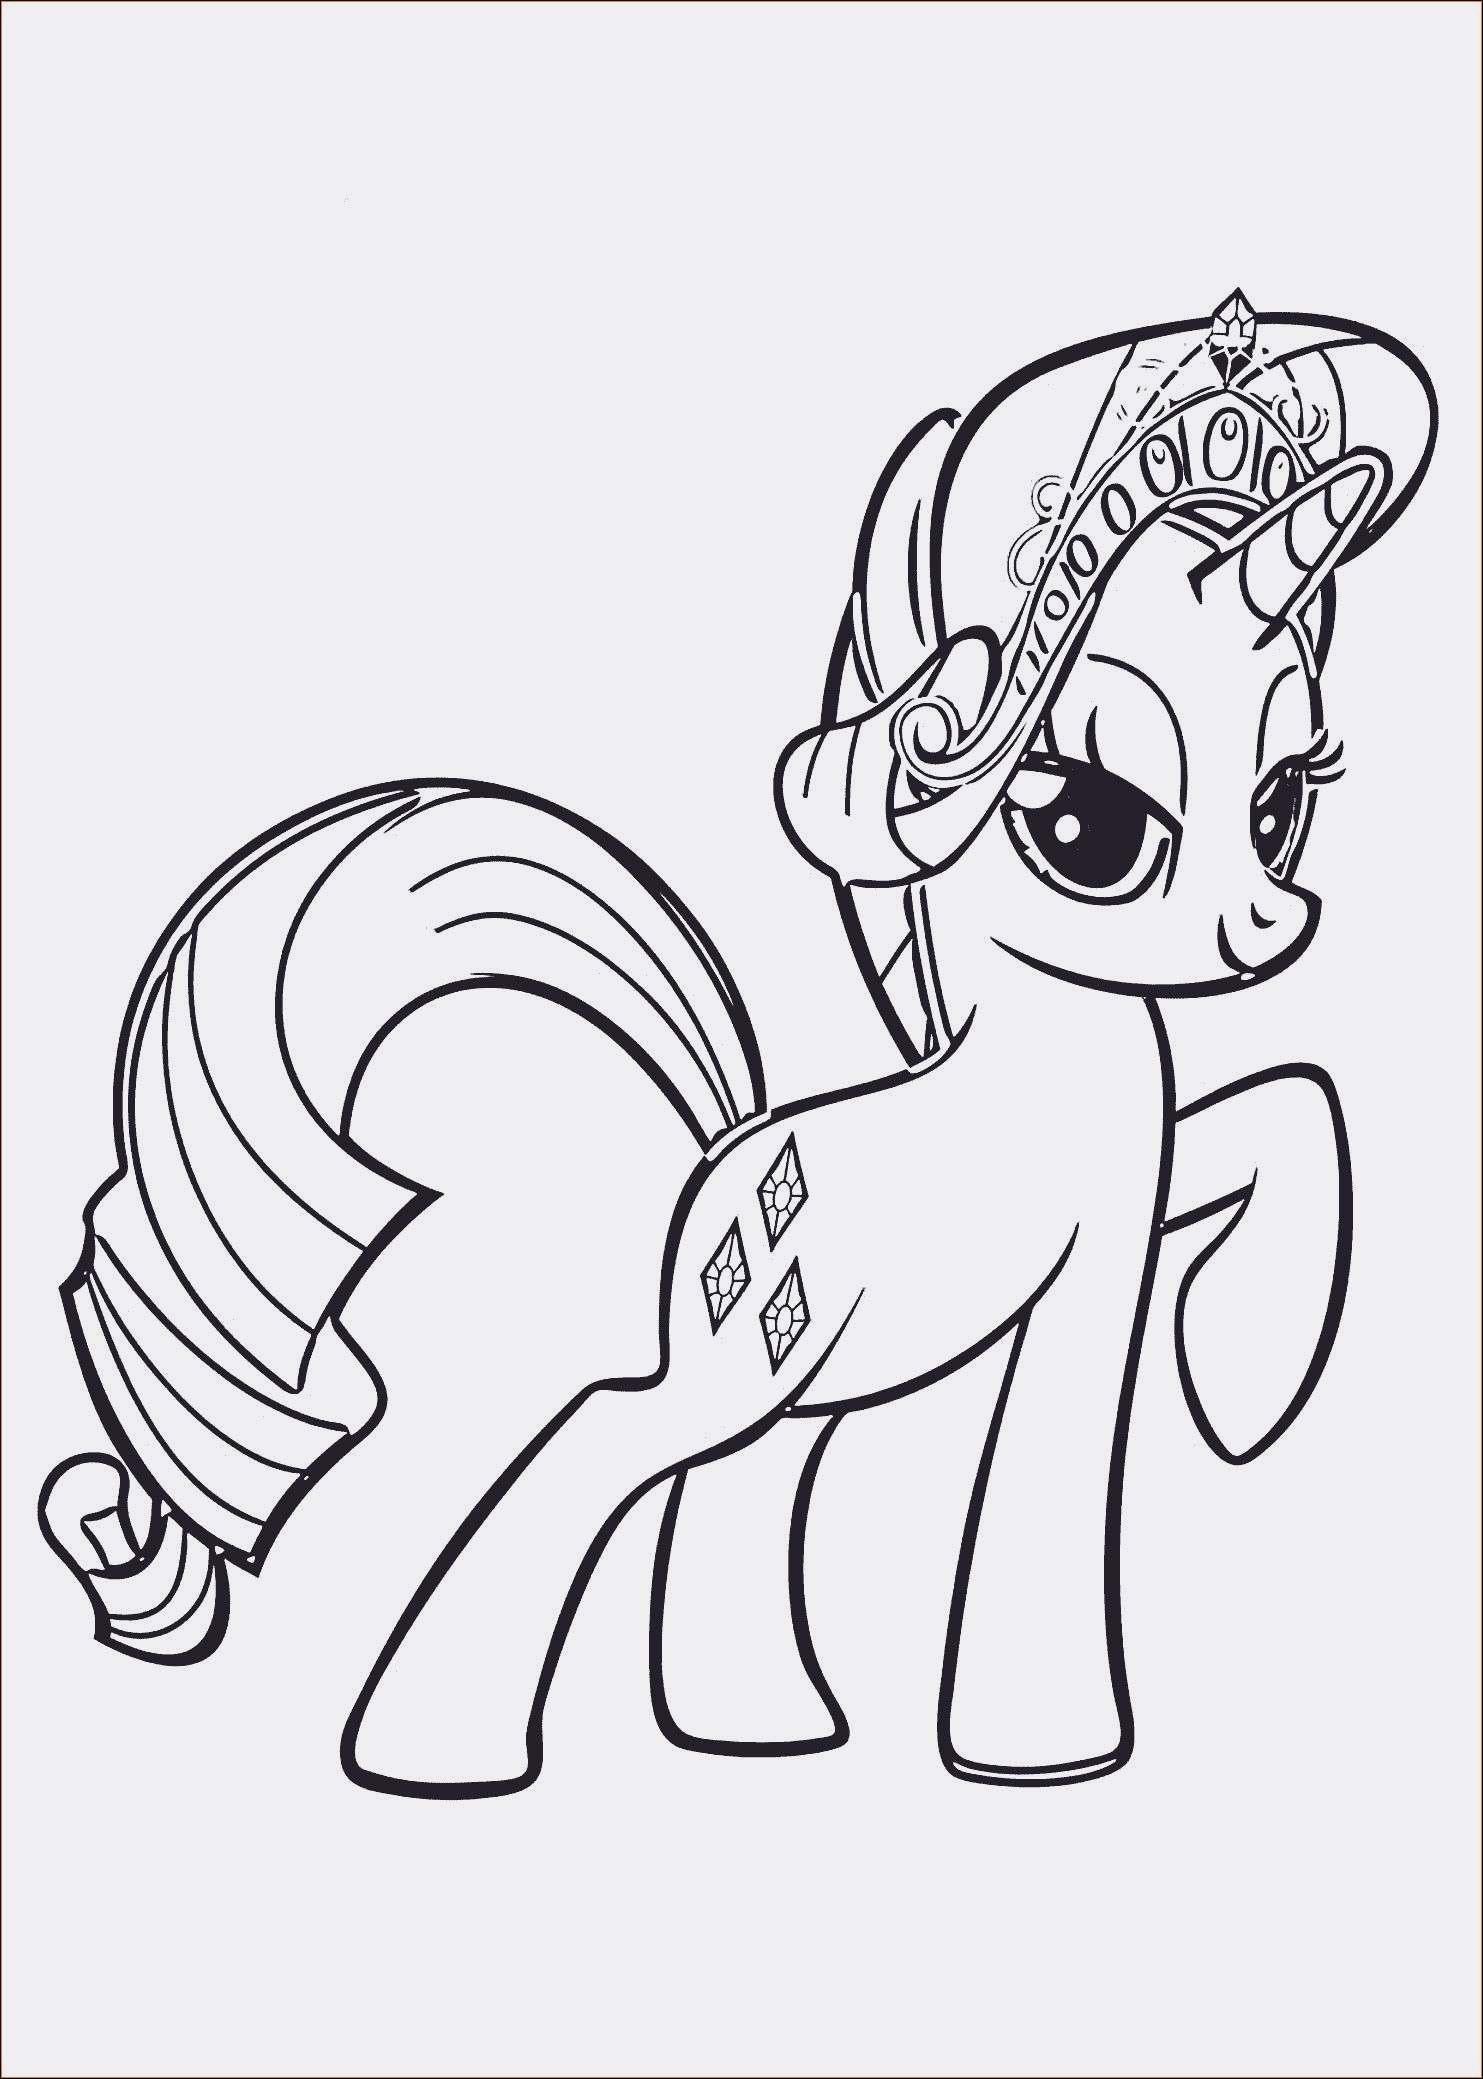 My Little Pony Friendship is Magic Ausmalbilder Neu Beispielbilder Färben My Little Pony Ausmalbilder Einzigartig My Bild